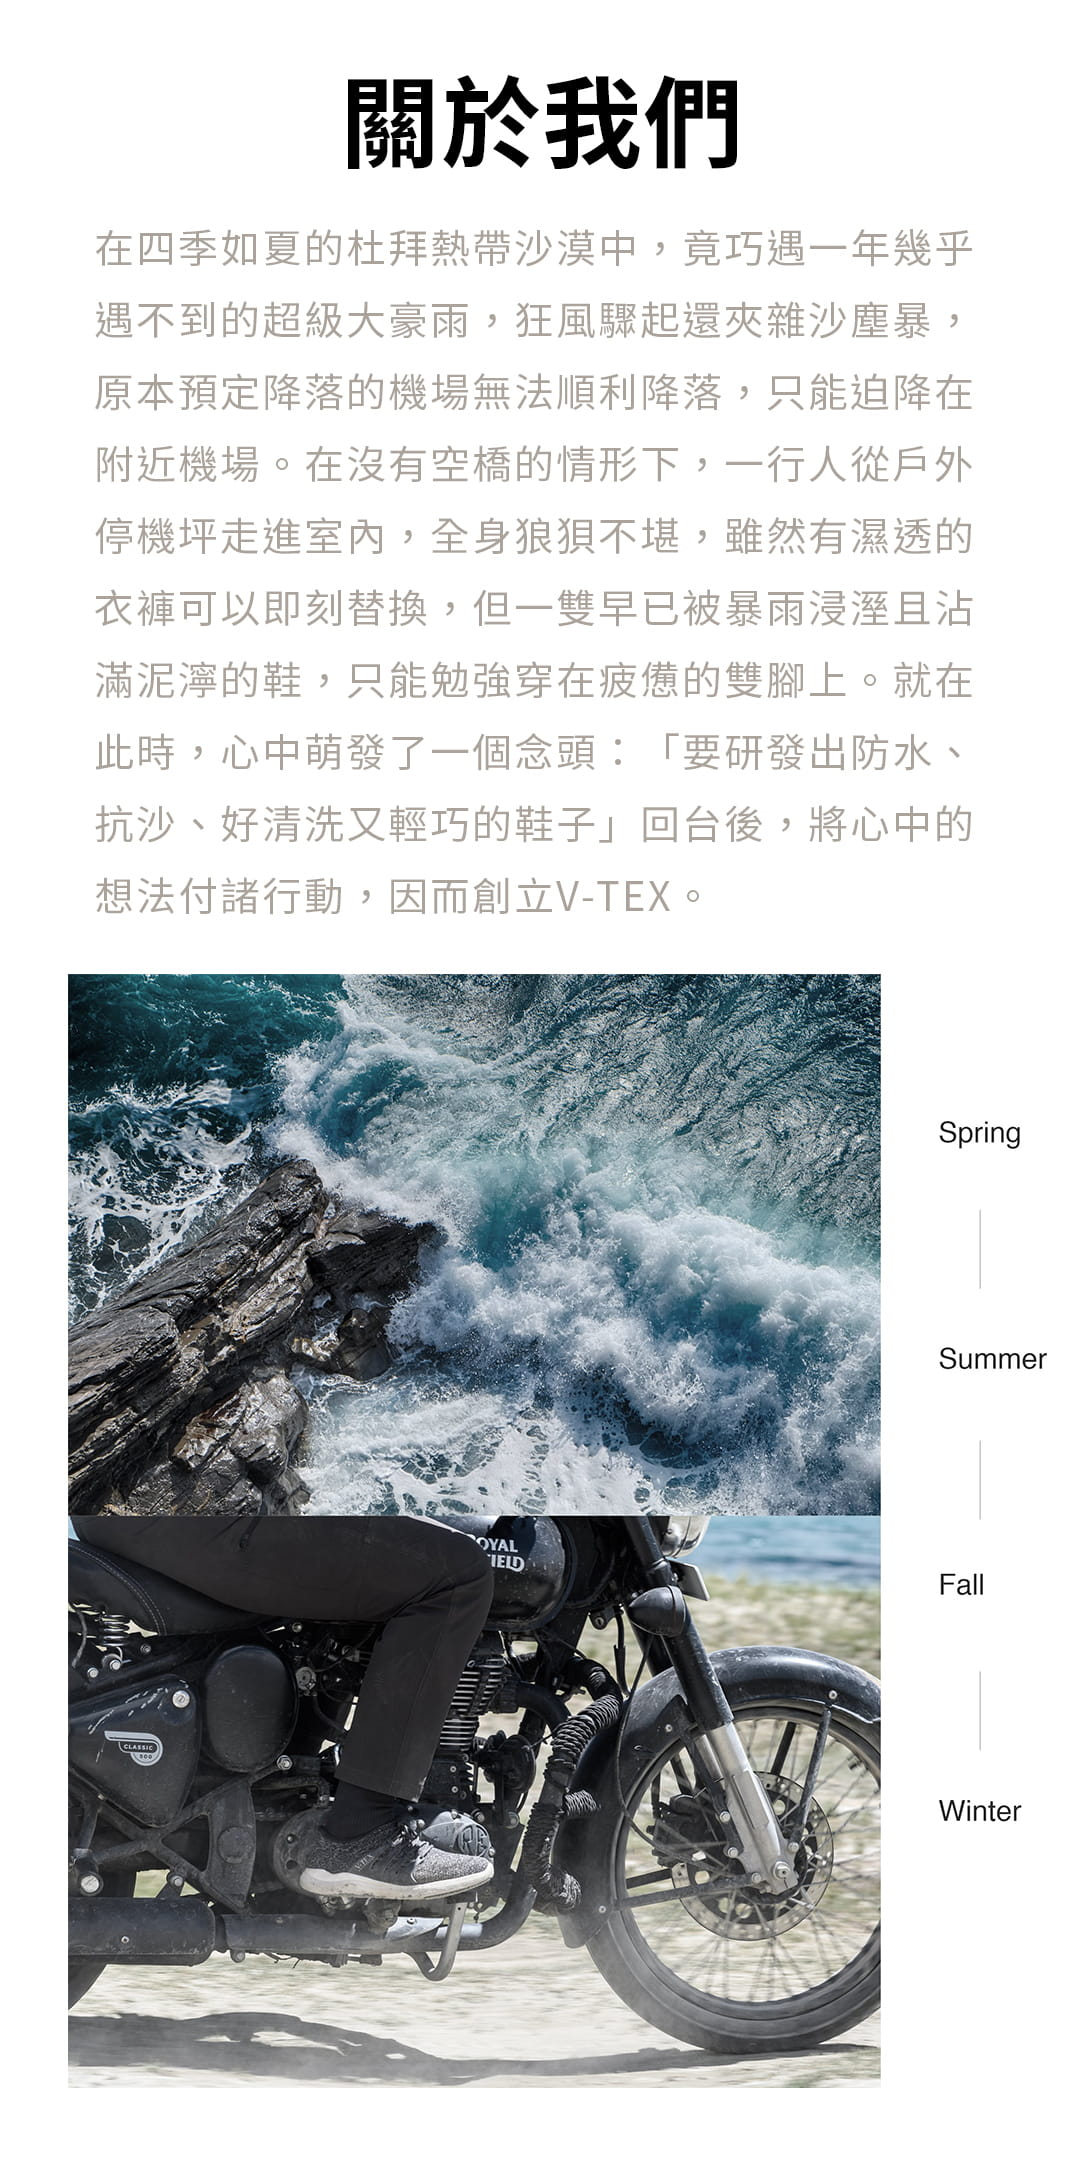 【V-TEX 地表最強防水鞋】【V-TEX機能防水鞋】Shark系列 夜武士 15